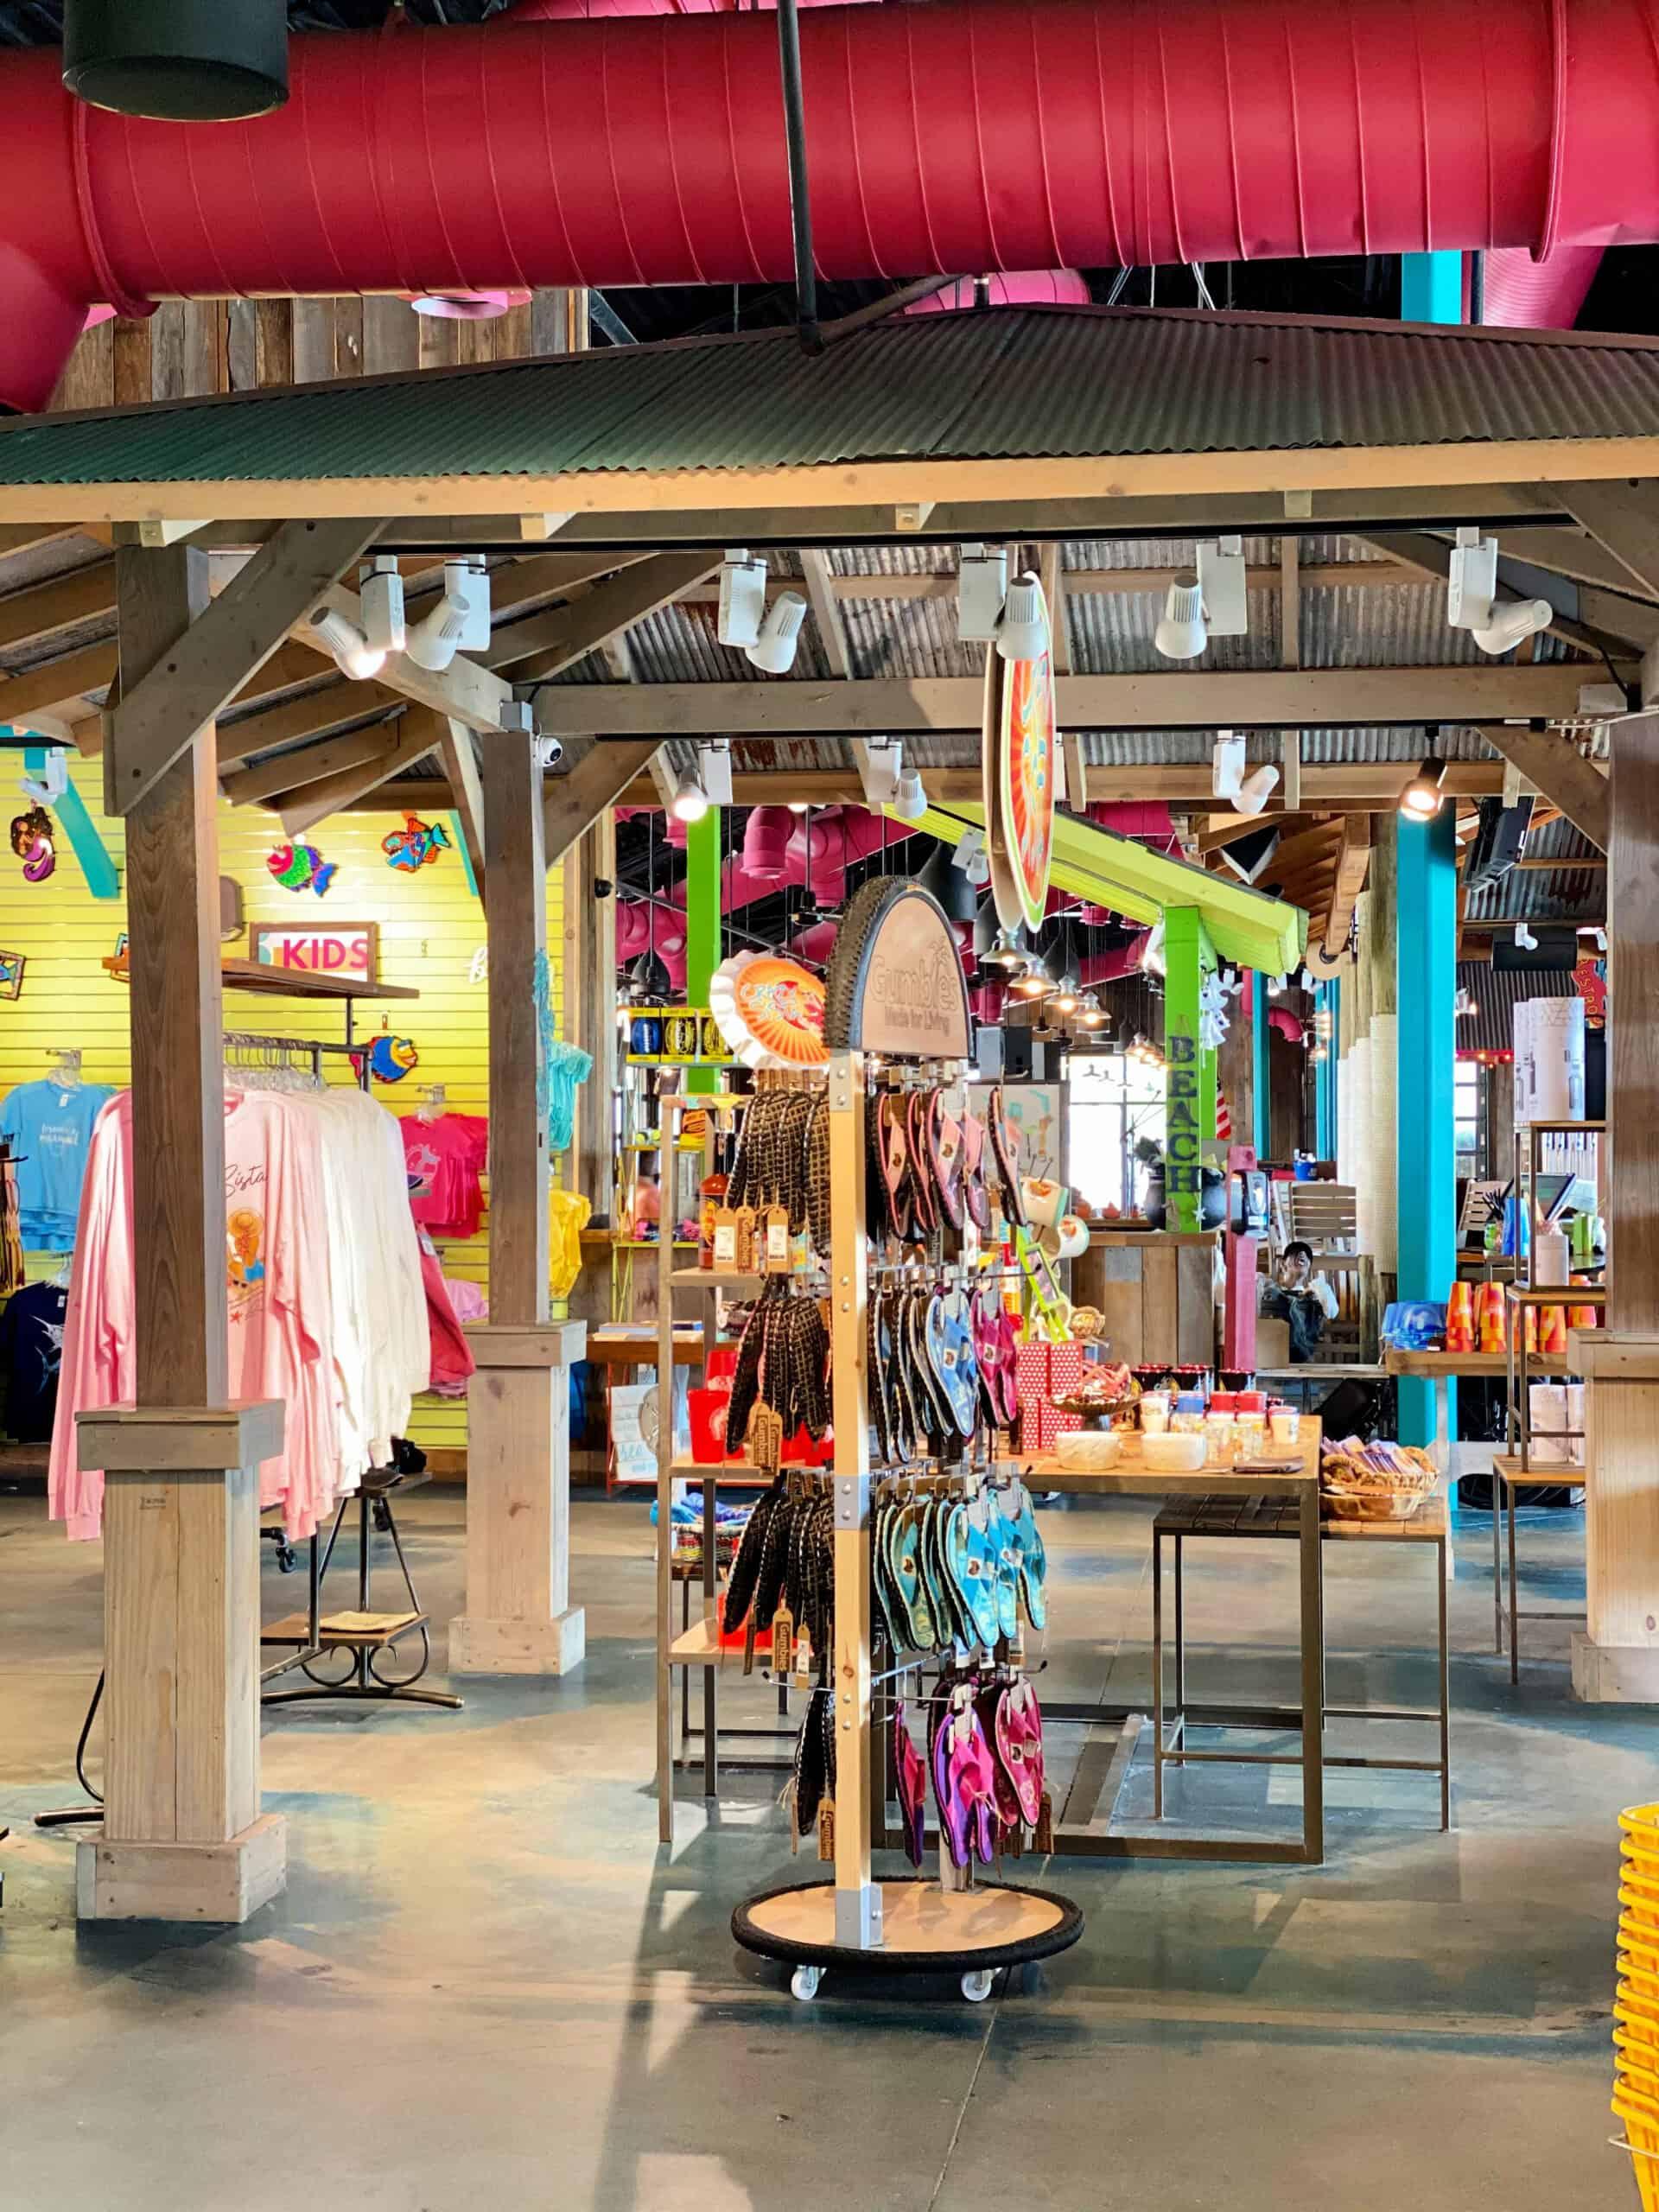 gift shop with flip flops